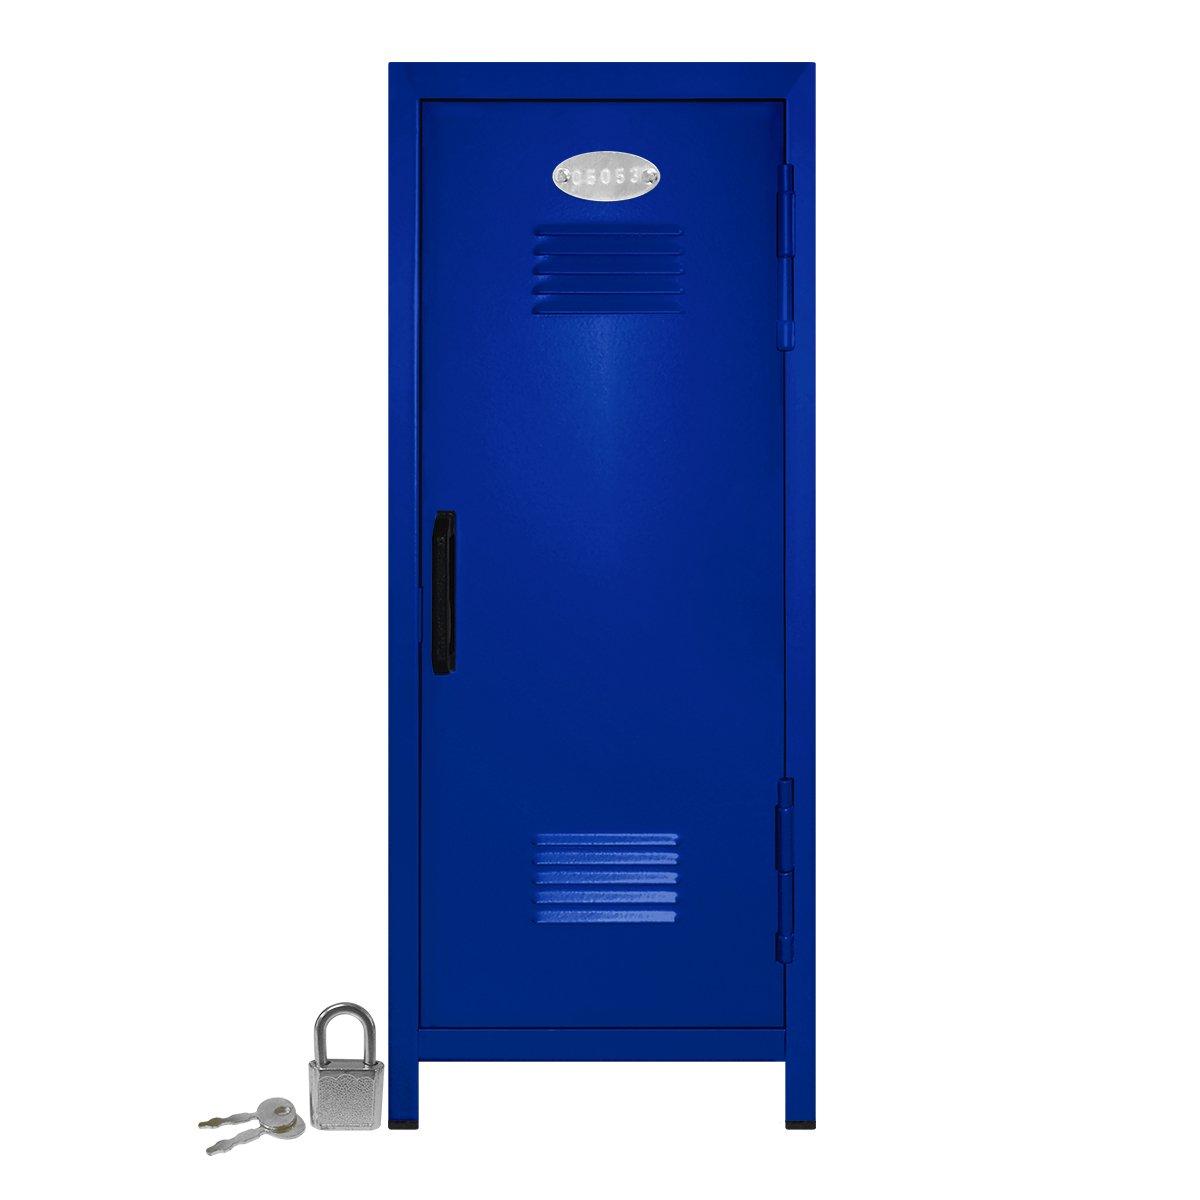 Mini Locker with Lock and Key Blue -10.75'' Tall x 4.125'' x 4.125'' by Mini Lockers by Magnetic Impressions